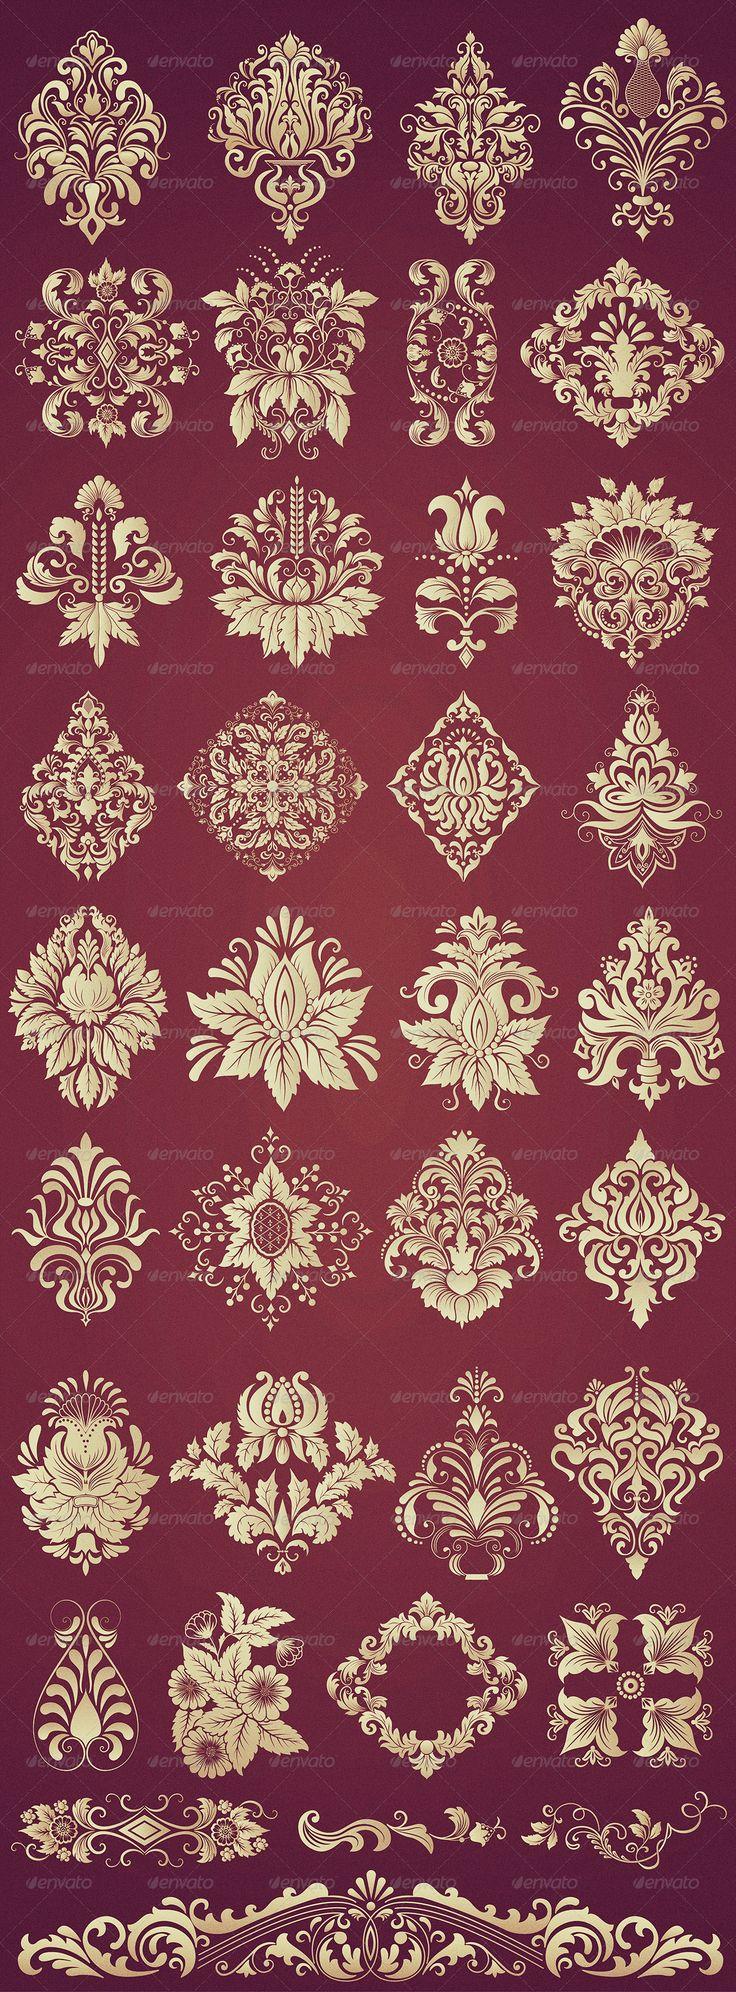 36 Damask Ornamental Elements